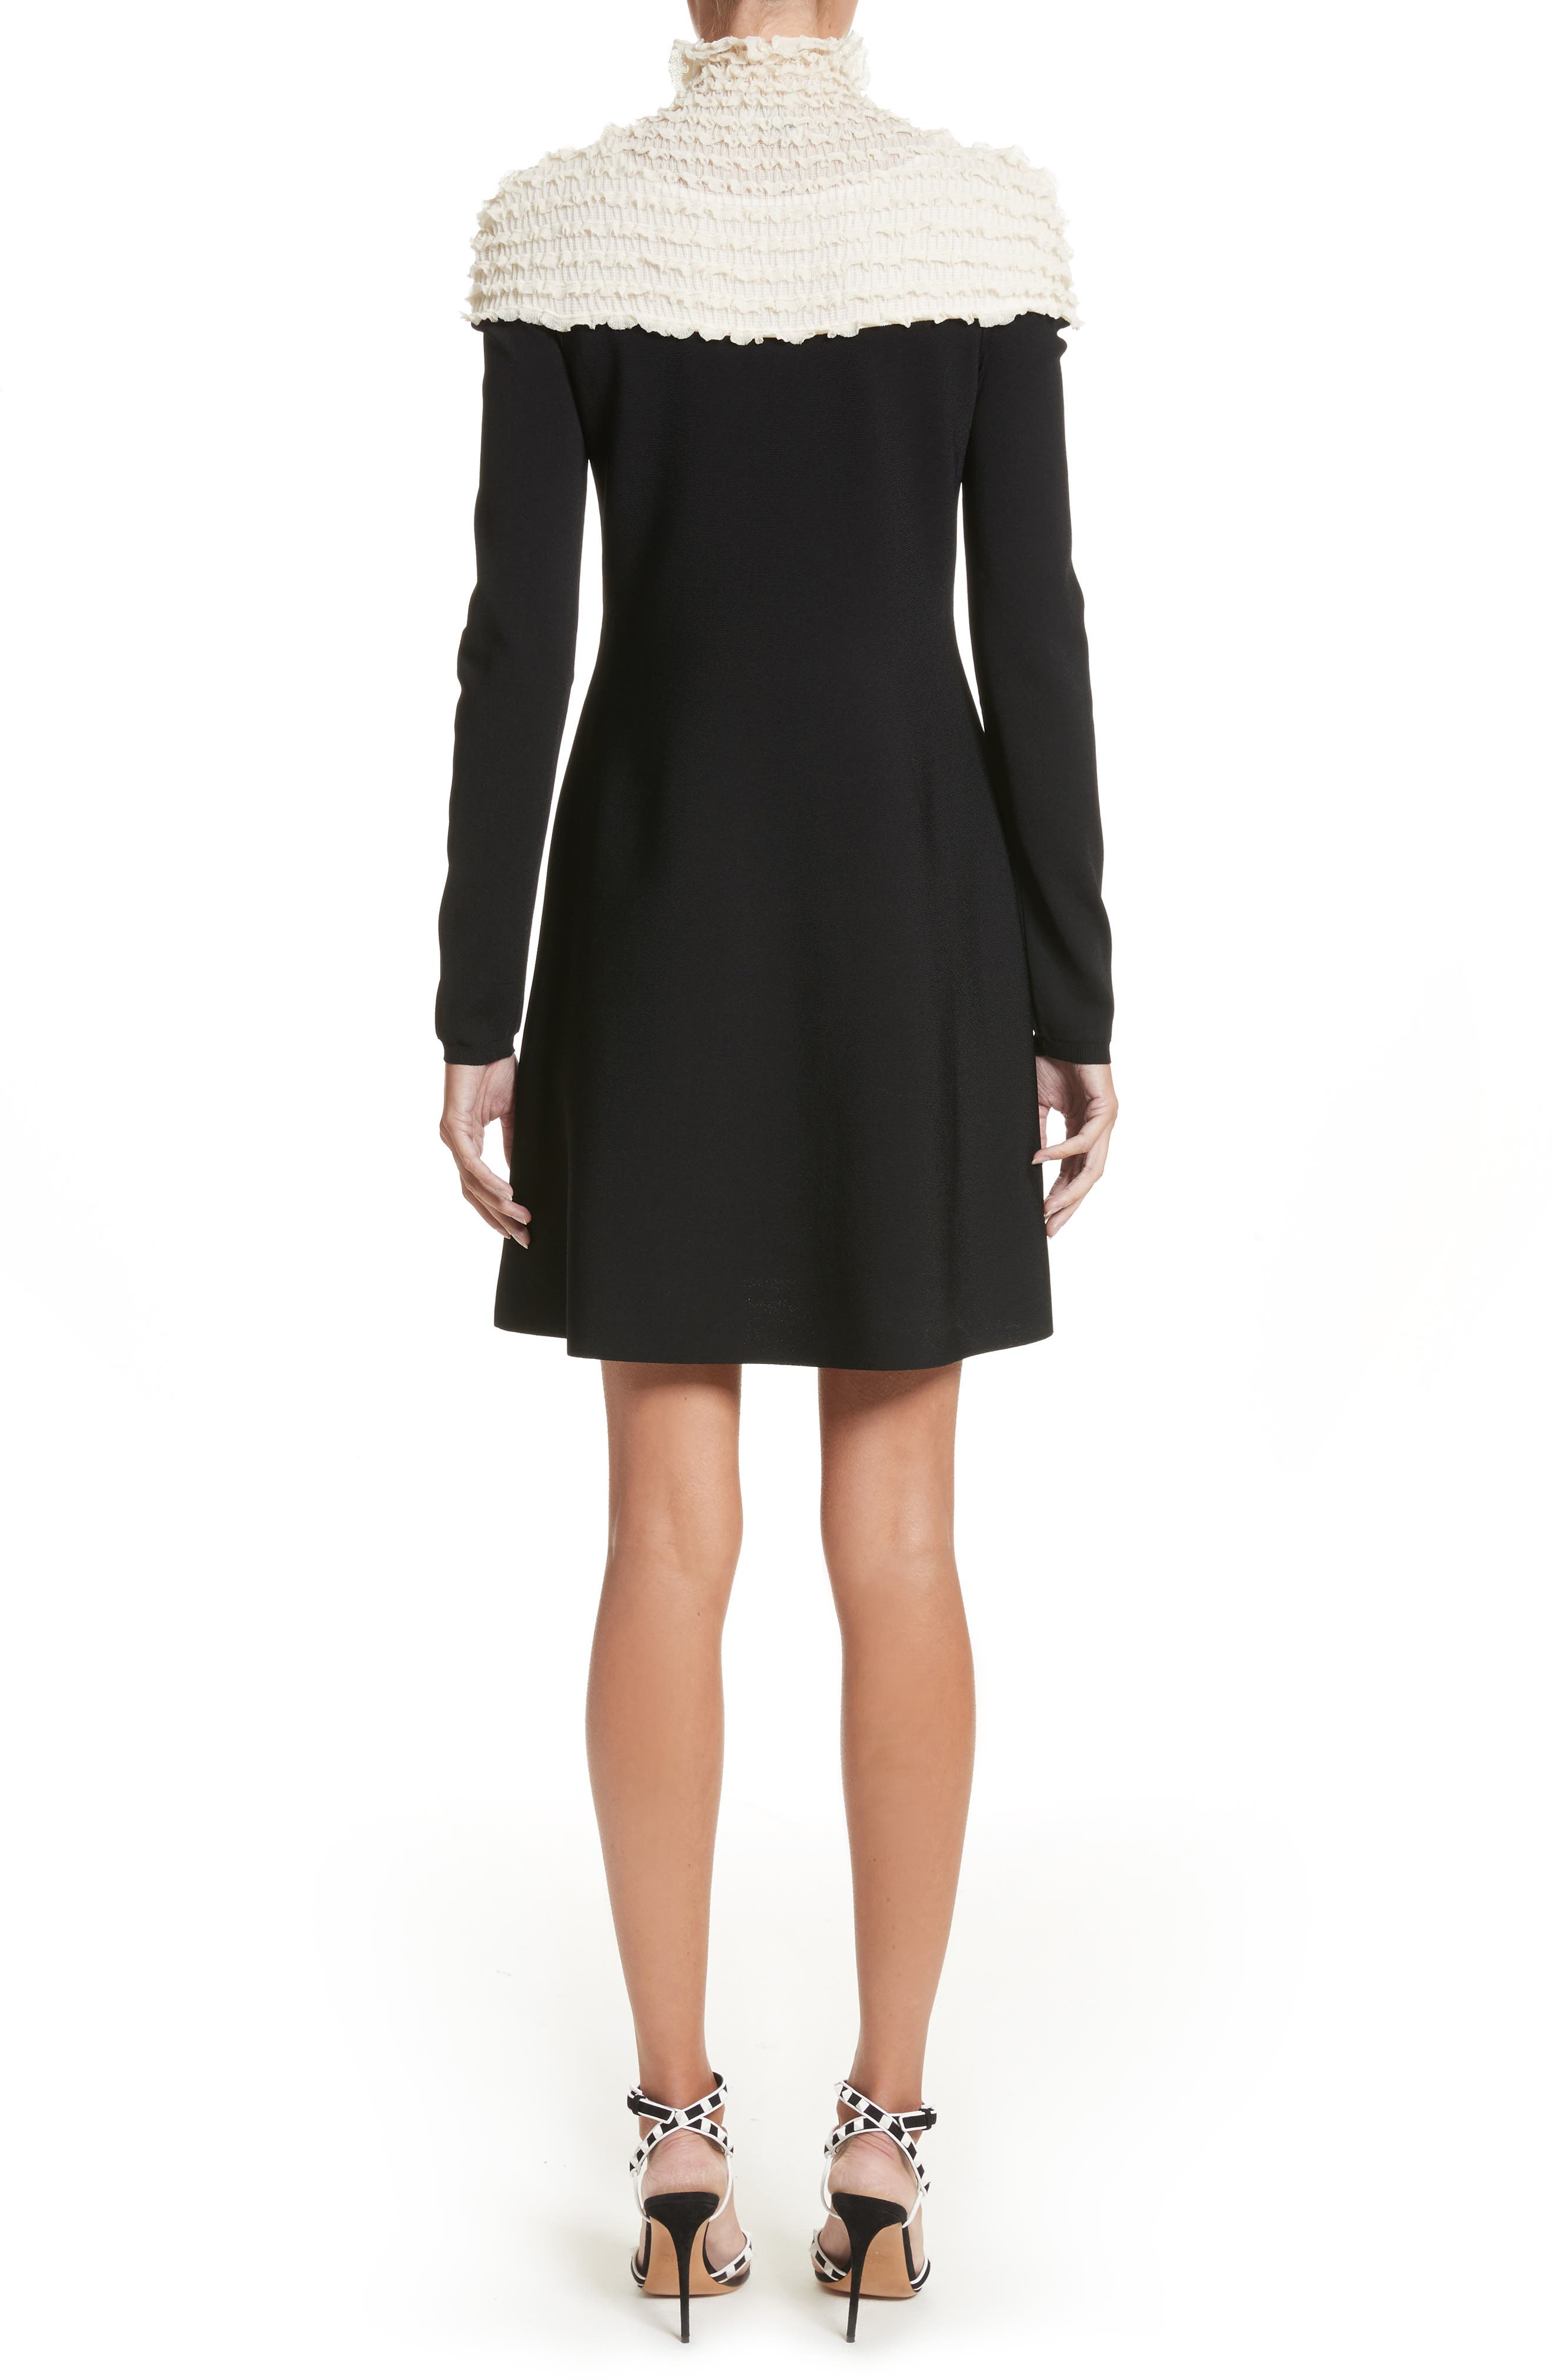 Ruffle Neckline Knit Dress,                             Alternate thumbnail 2, color,                             Black/ Ivory